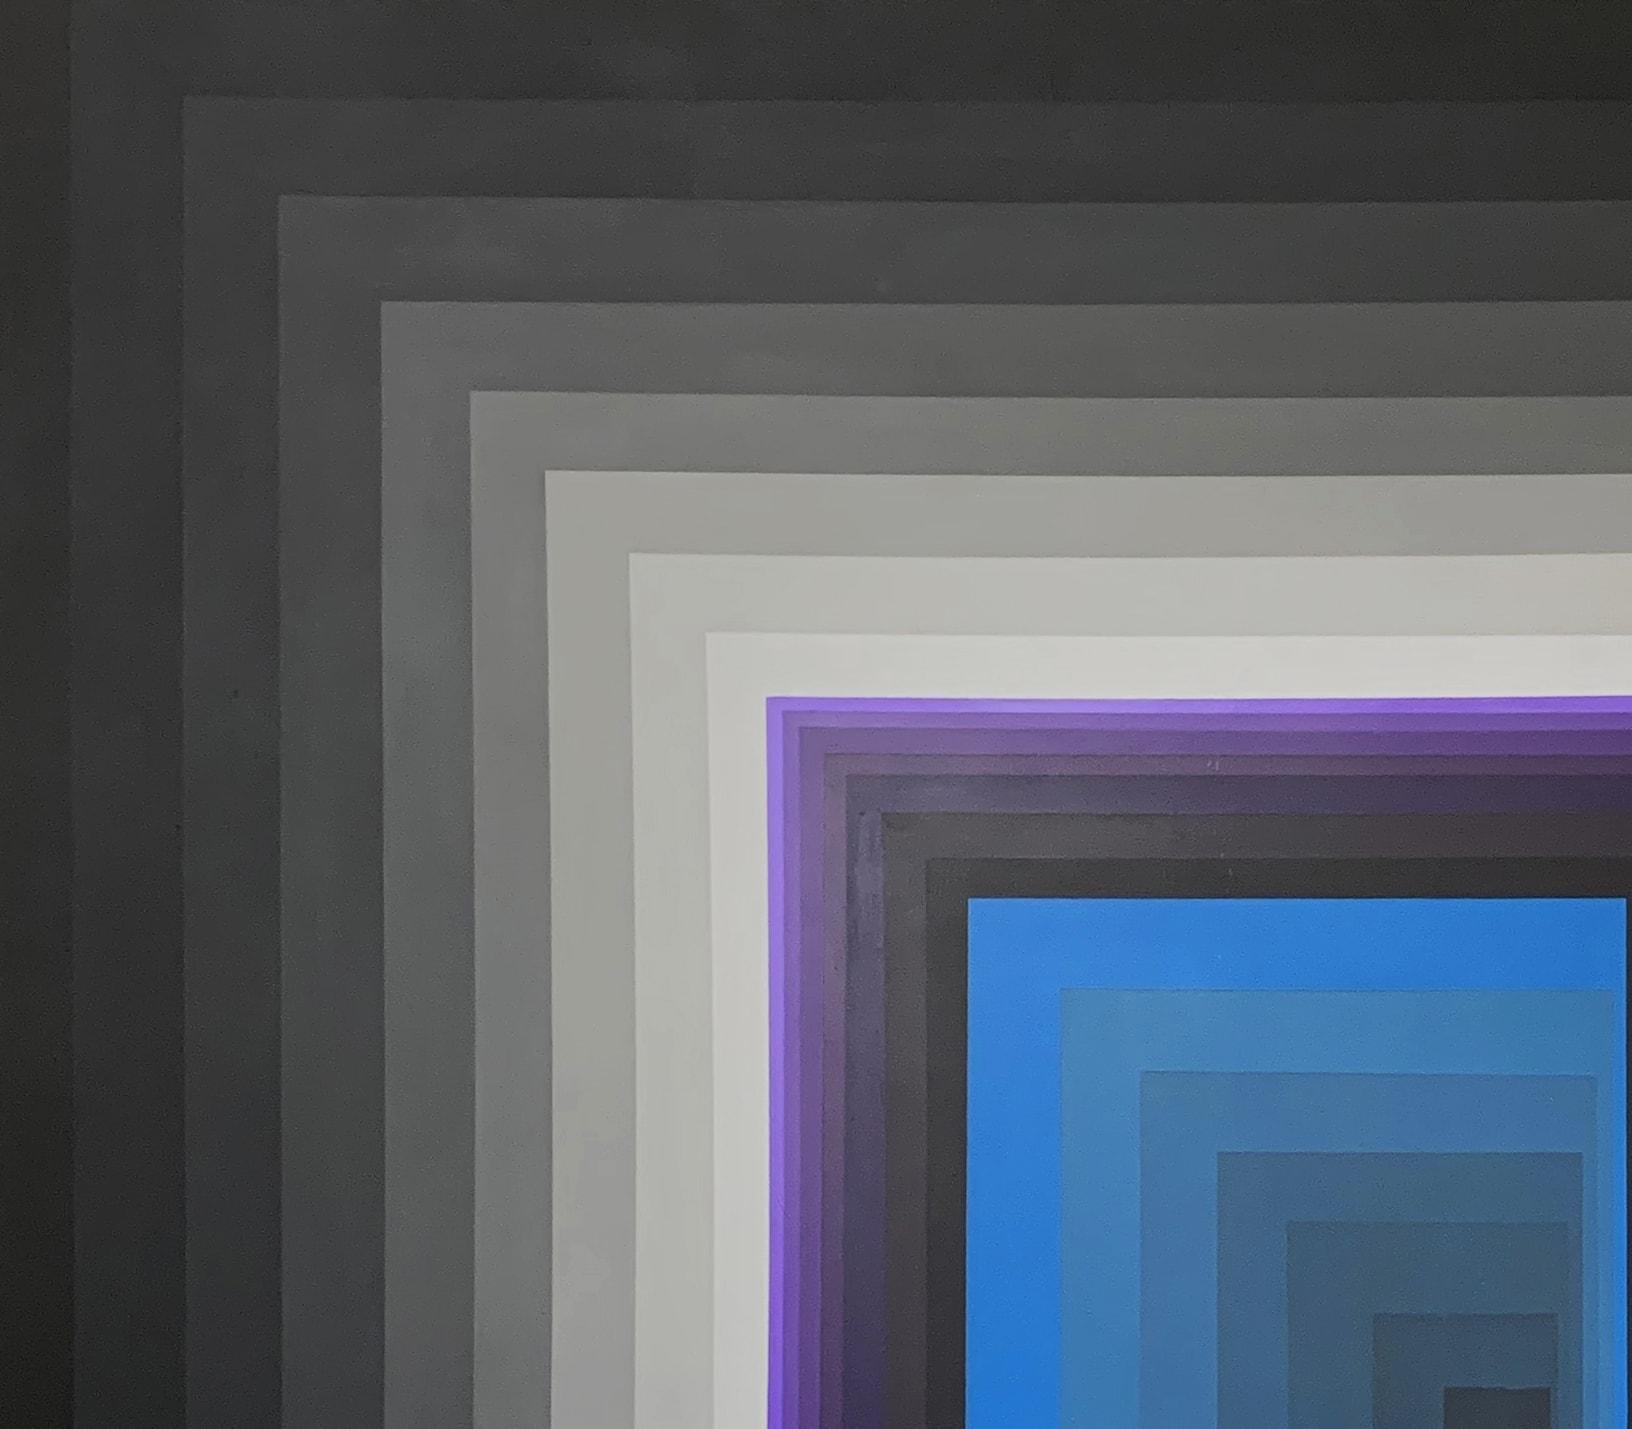 bild malen lassen moderne kunst